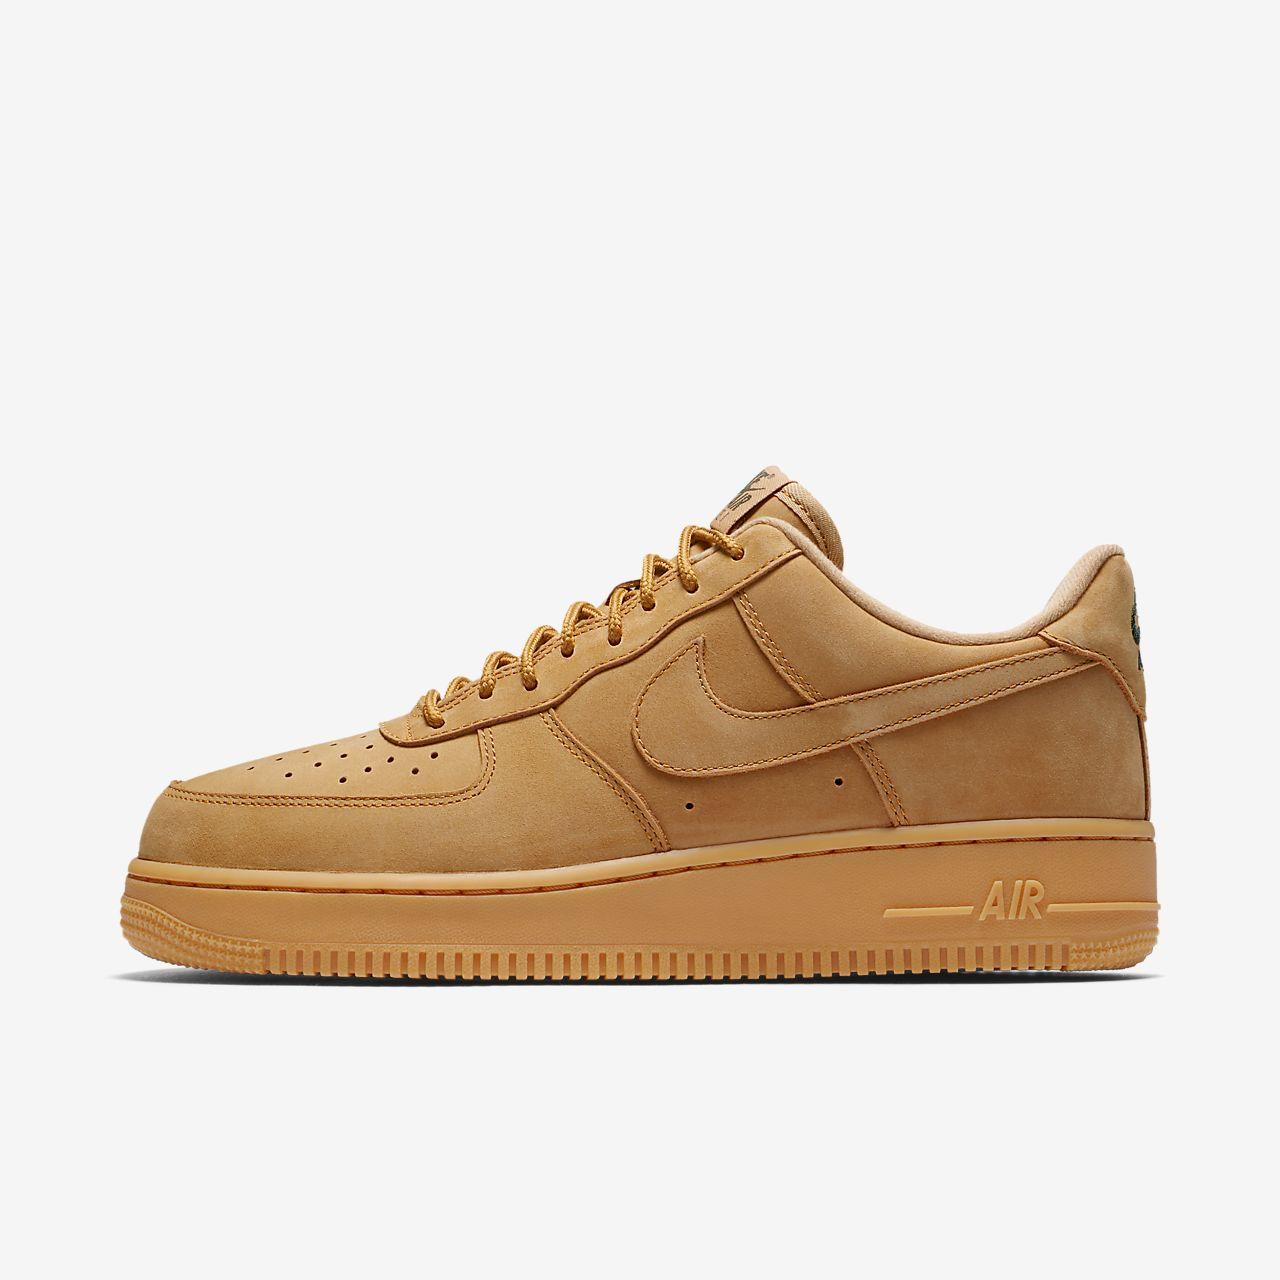 online store 7f885 8a3c5 ... Sapatilhas Nike Air Force 1 07 WB para homem